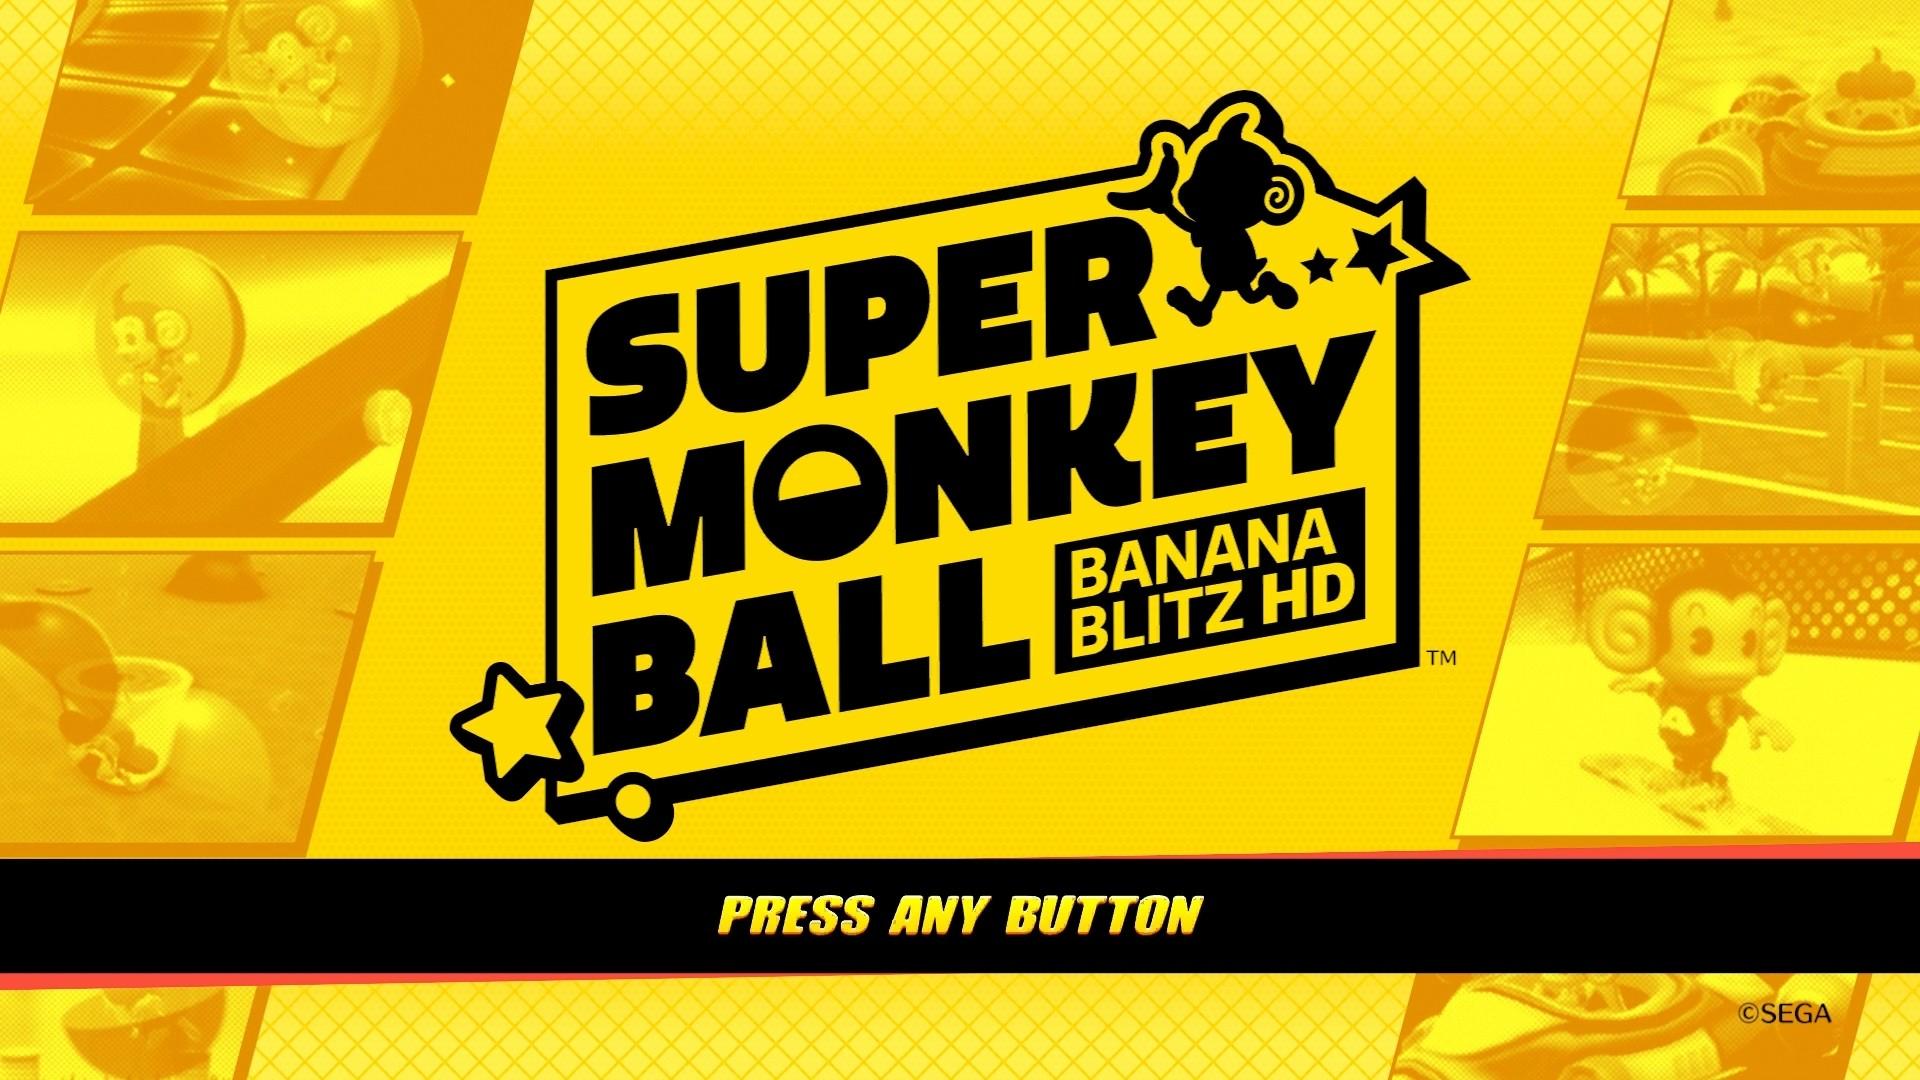 Super Monkey Ball: Banana Blitz HD on Steam